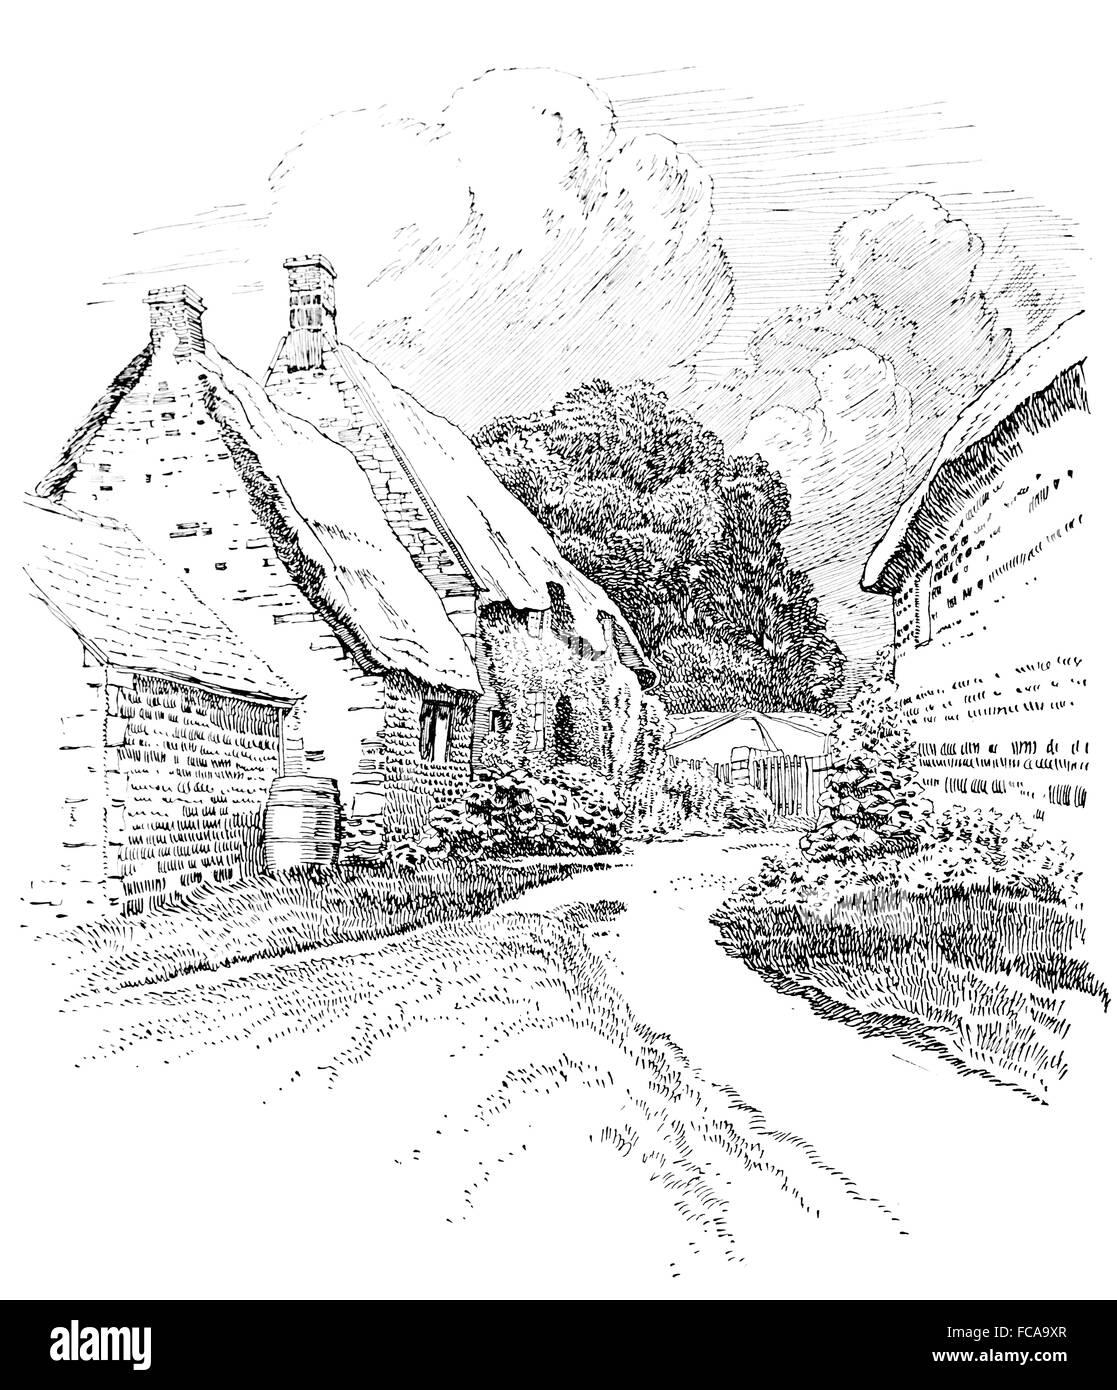 UK, England, Northamptonshire, Wilbarston, thatched cottage garden 1911 line illustration by, Sydney R Jones Stock Photo